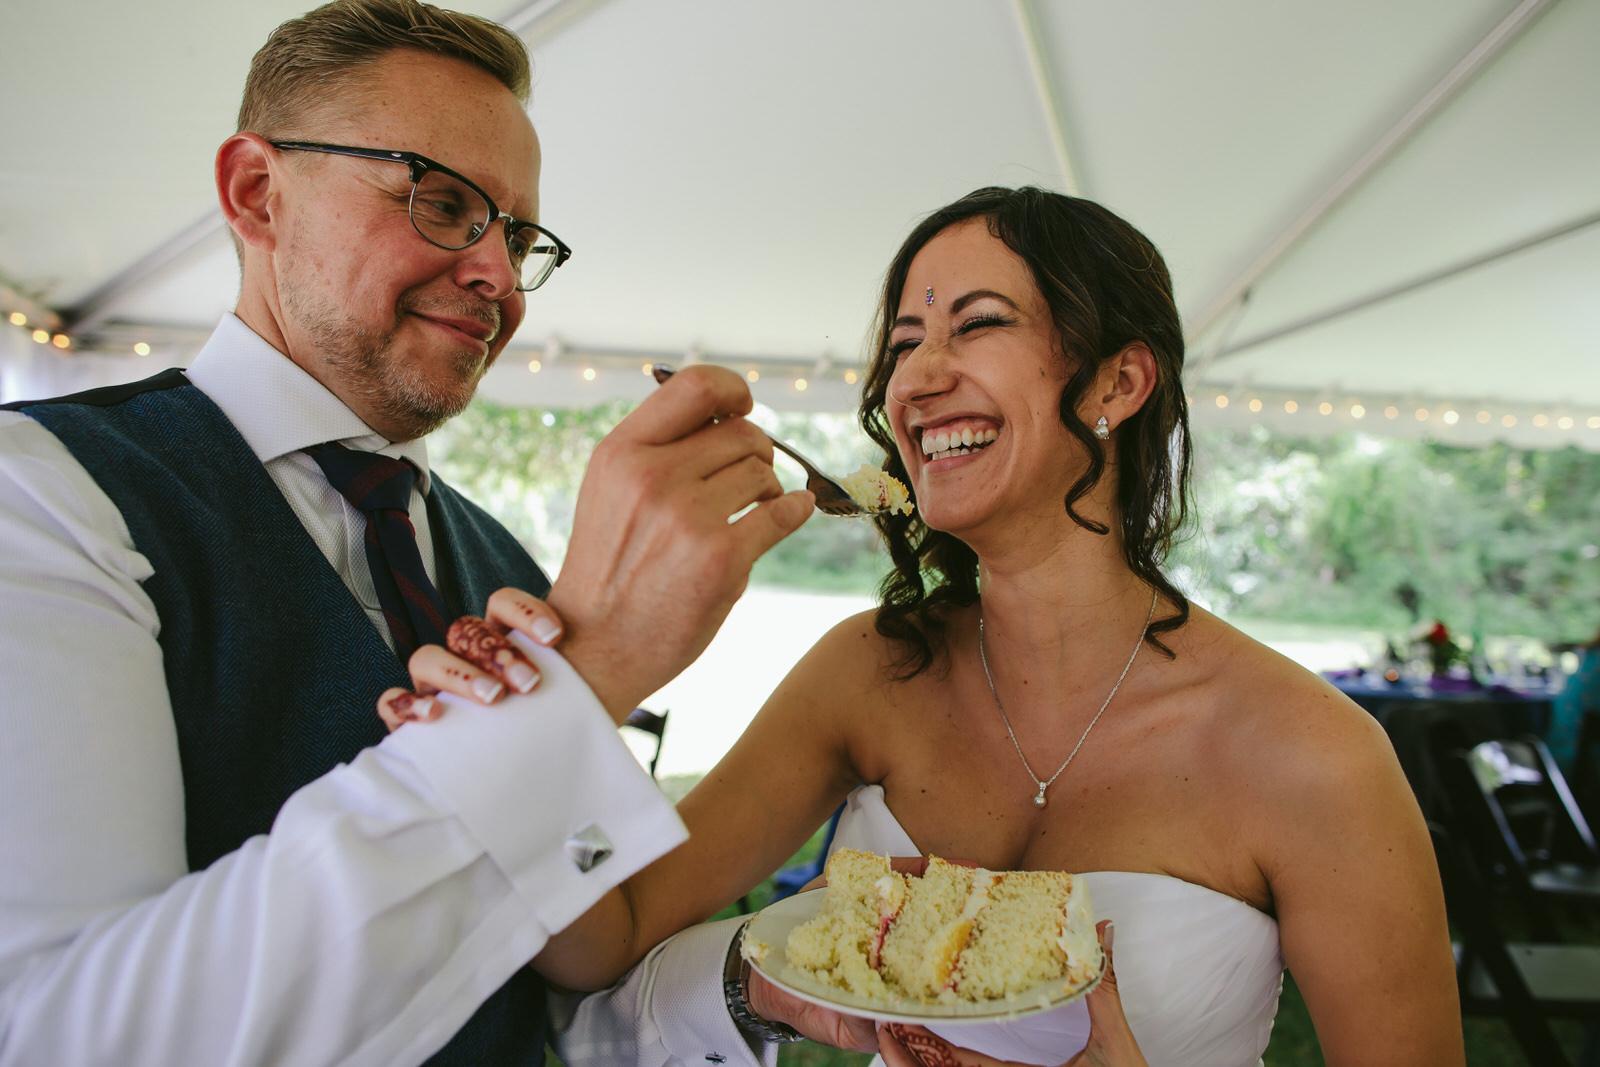 kashi-wedding-reception-tiny-house-photo-bride-groom-cake-moment.jpg